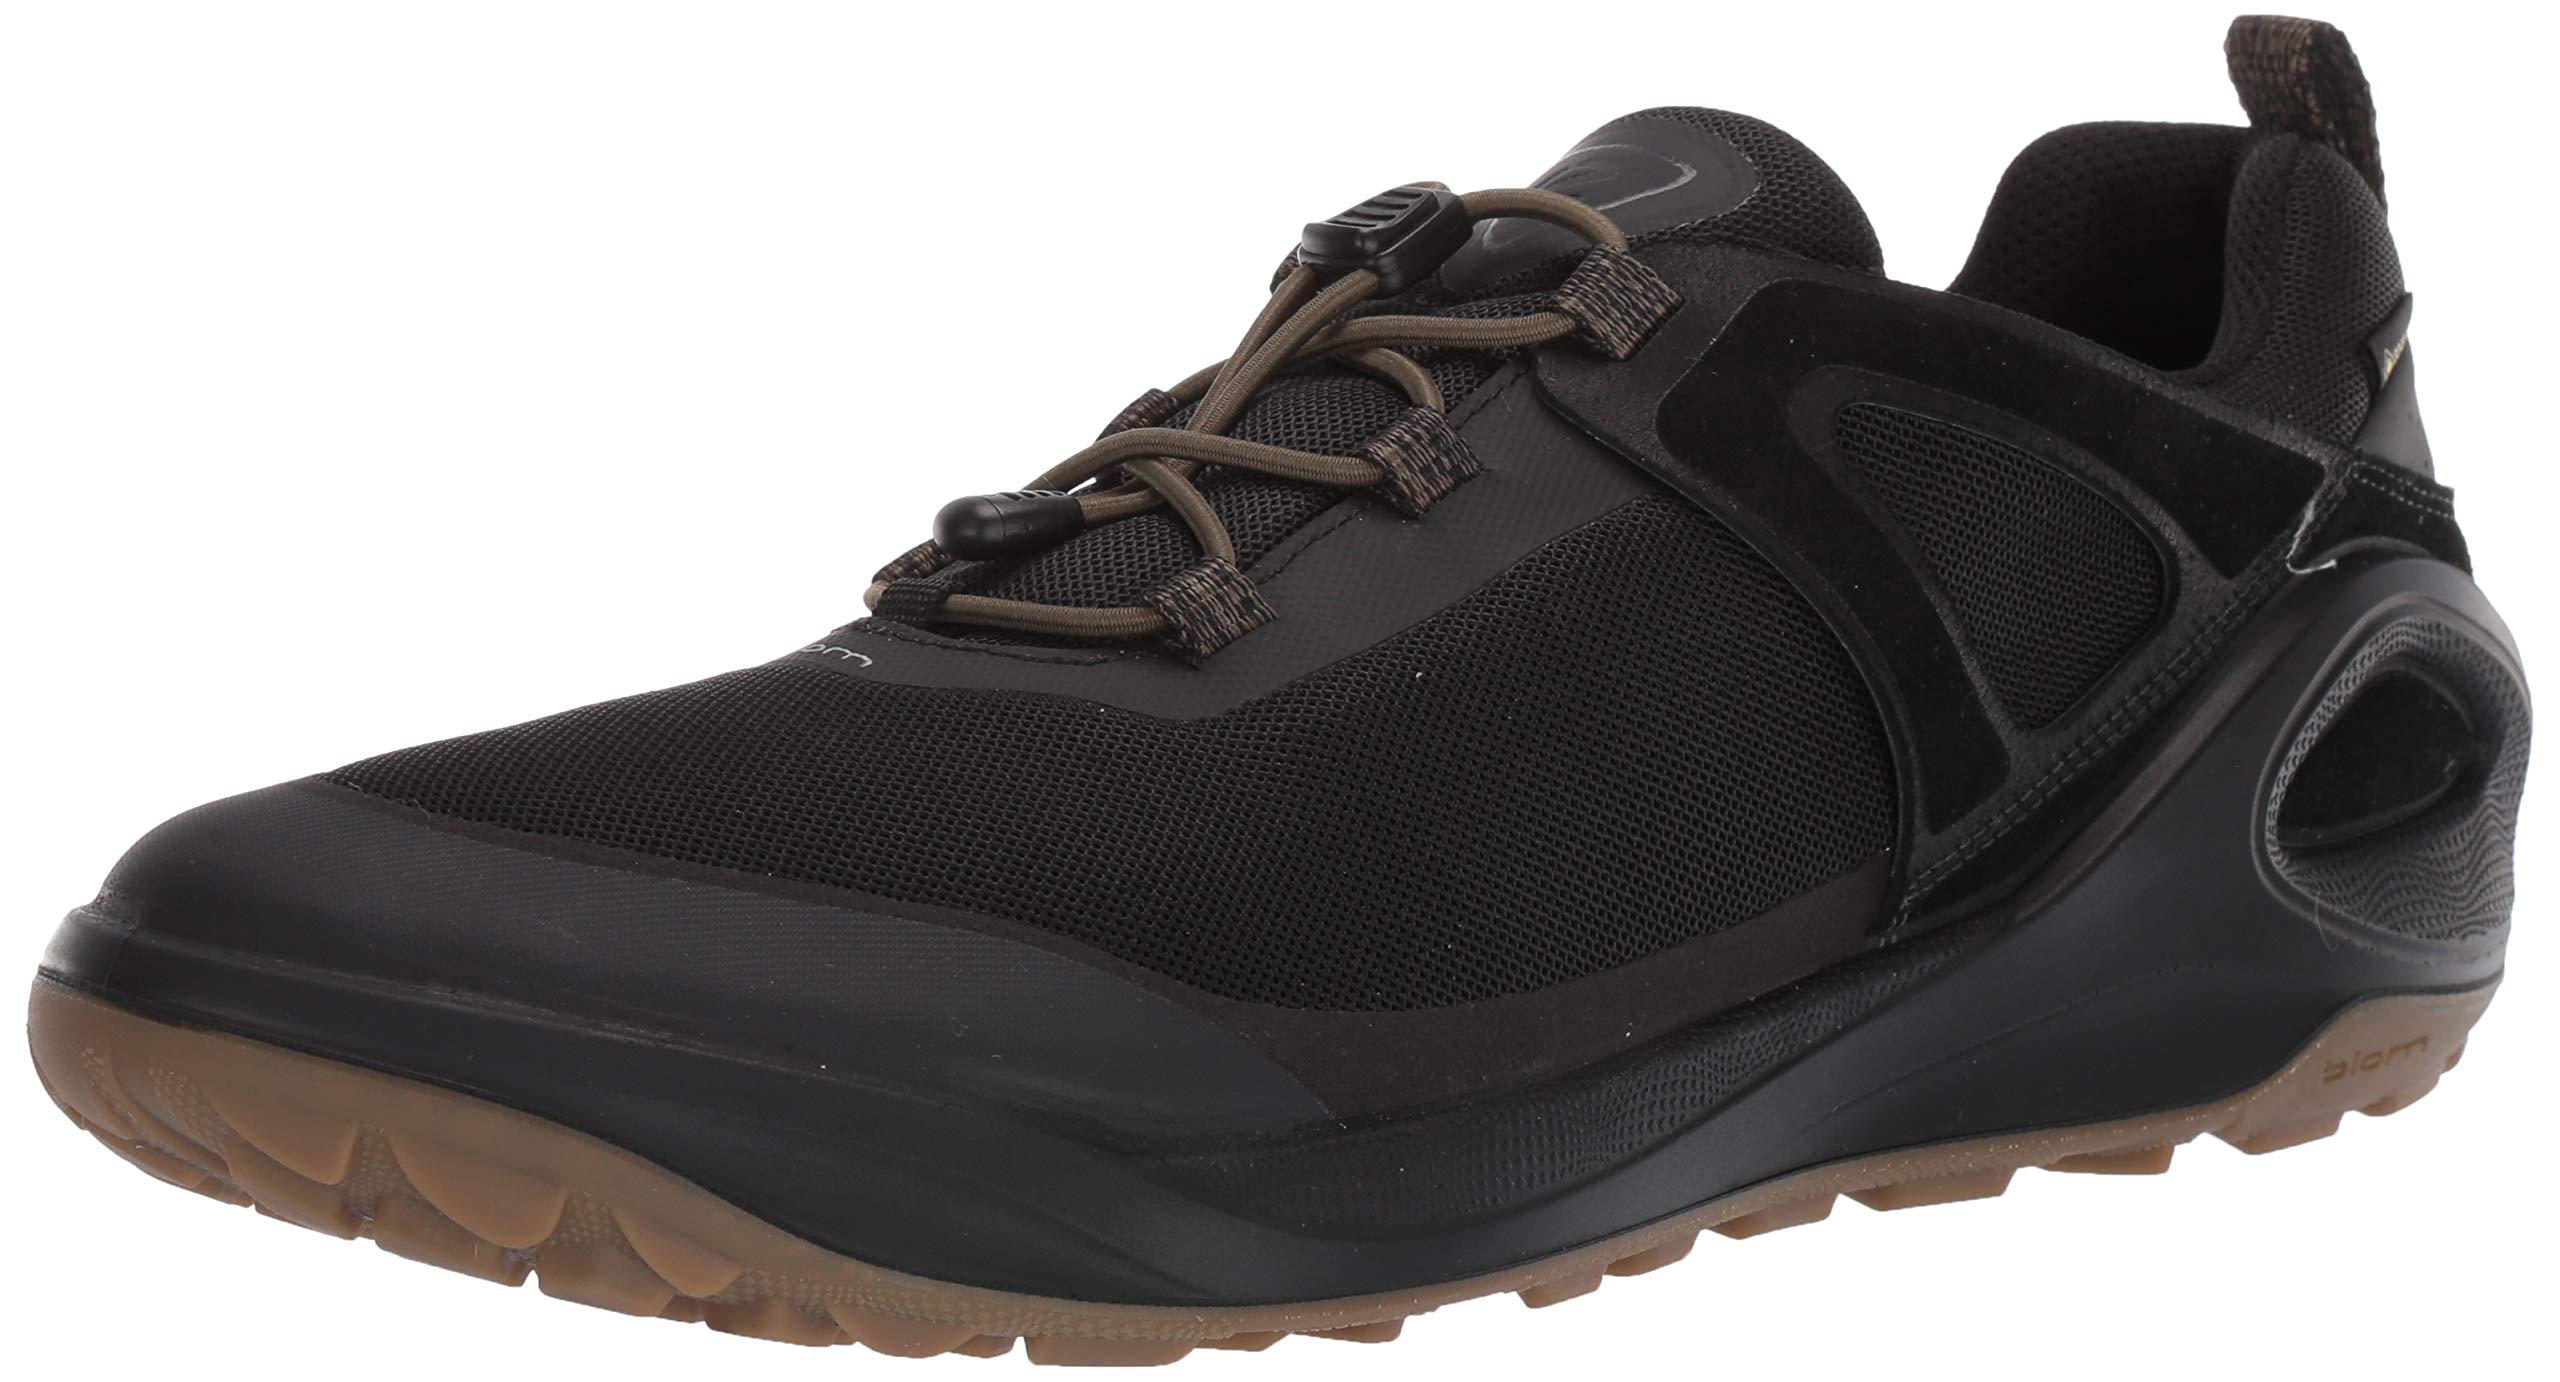 ECCO Men's Biom 2GO Gore-TEX-Waterproof Outdoor Lifestyle Multi-Sport Speed Lace Hiking Shoe, Tarmac/Black, 45 M EU (11-11.5 US) by ECCO